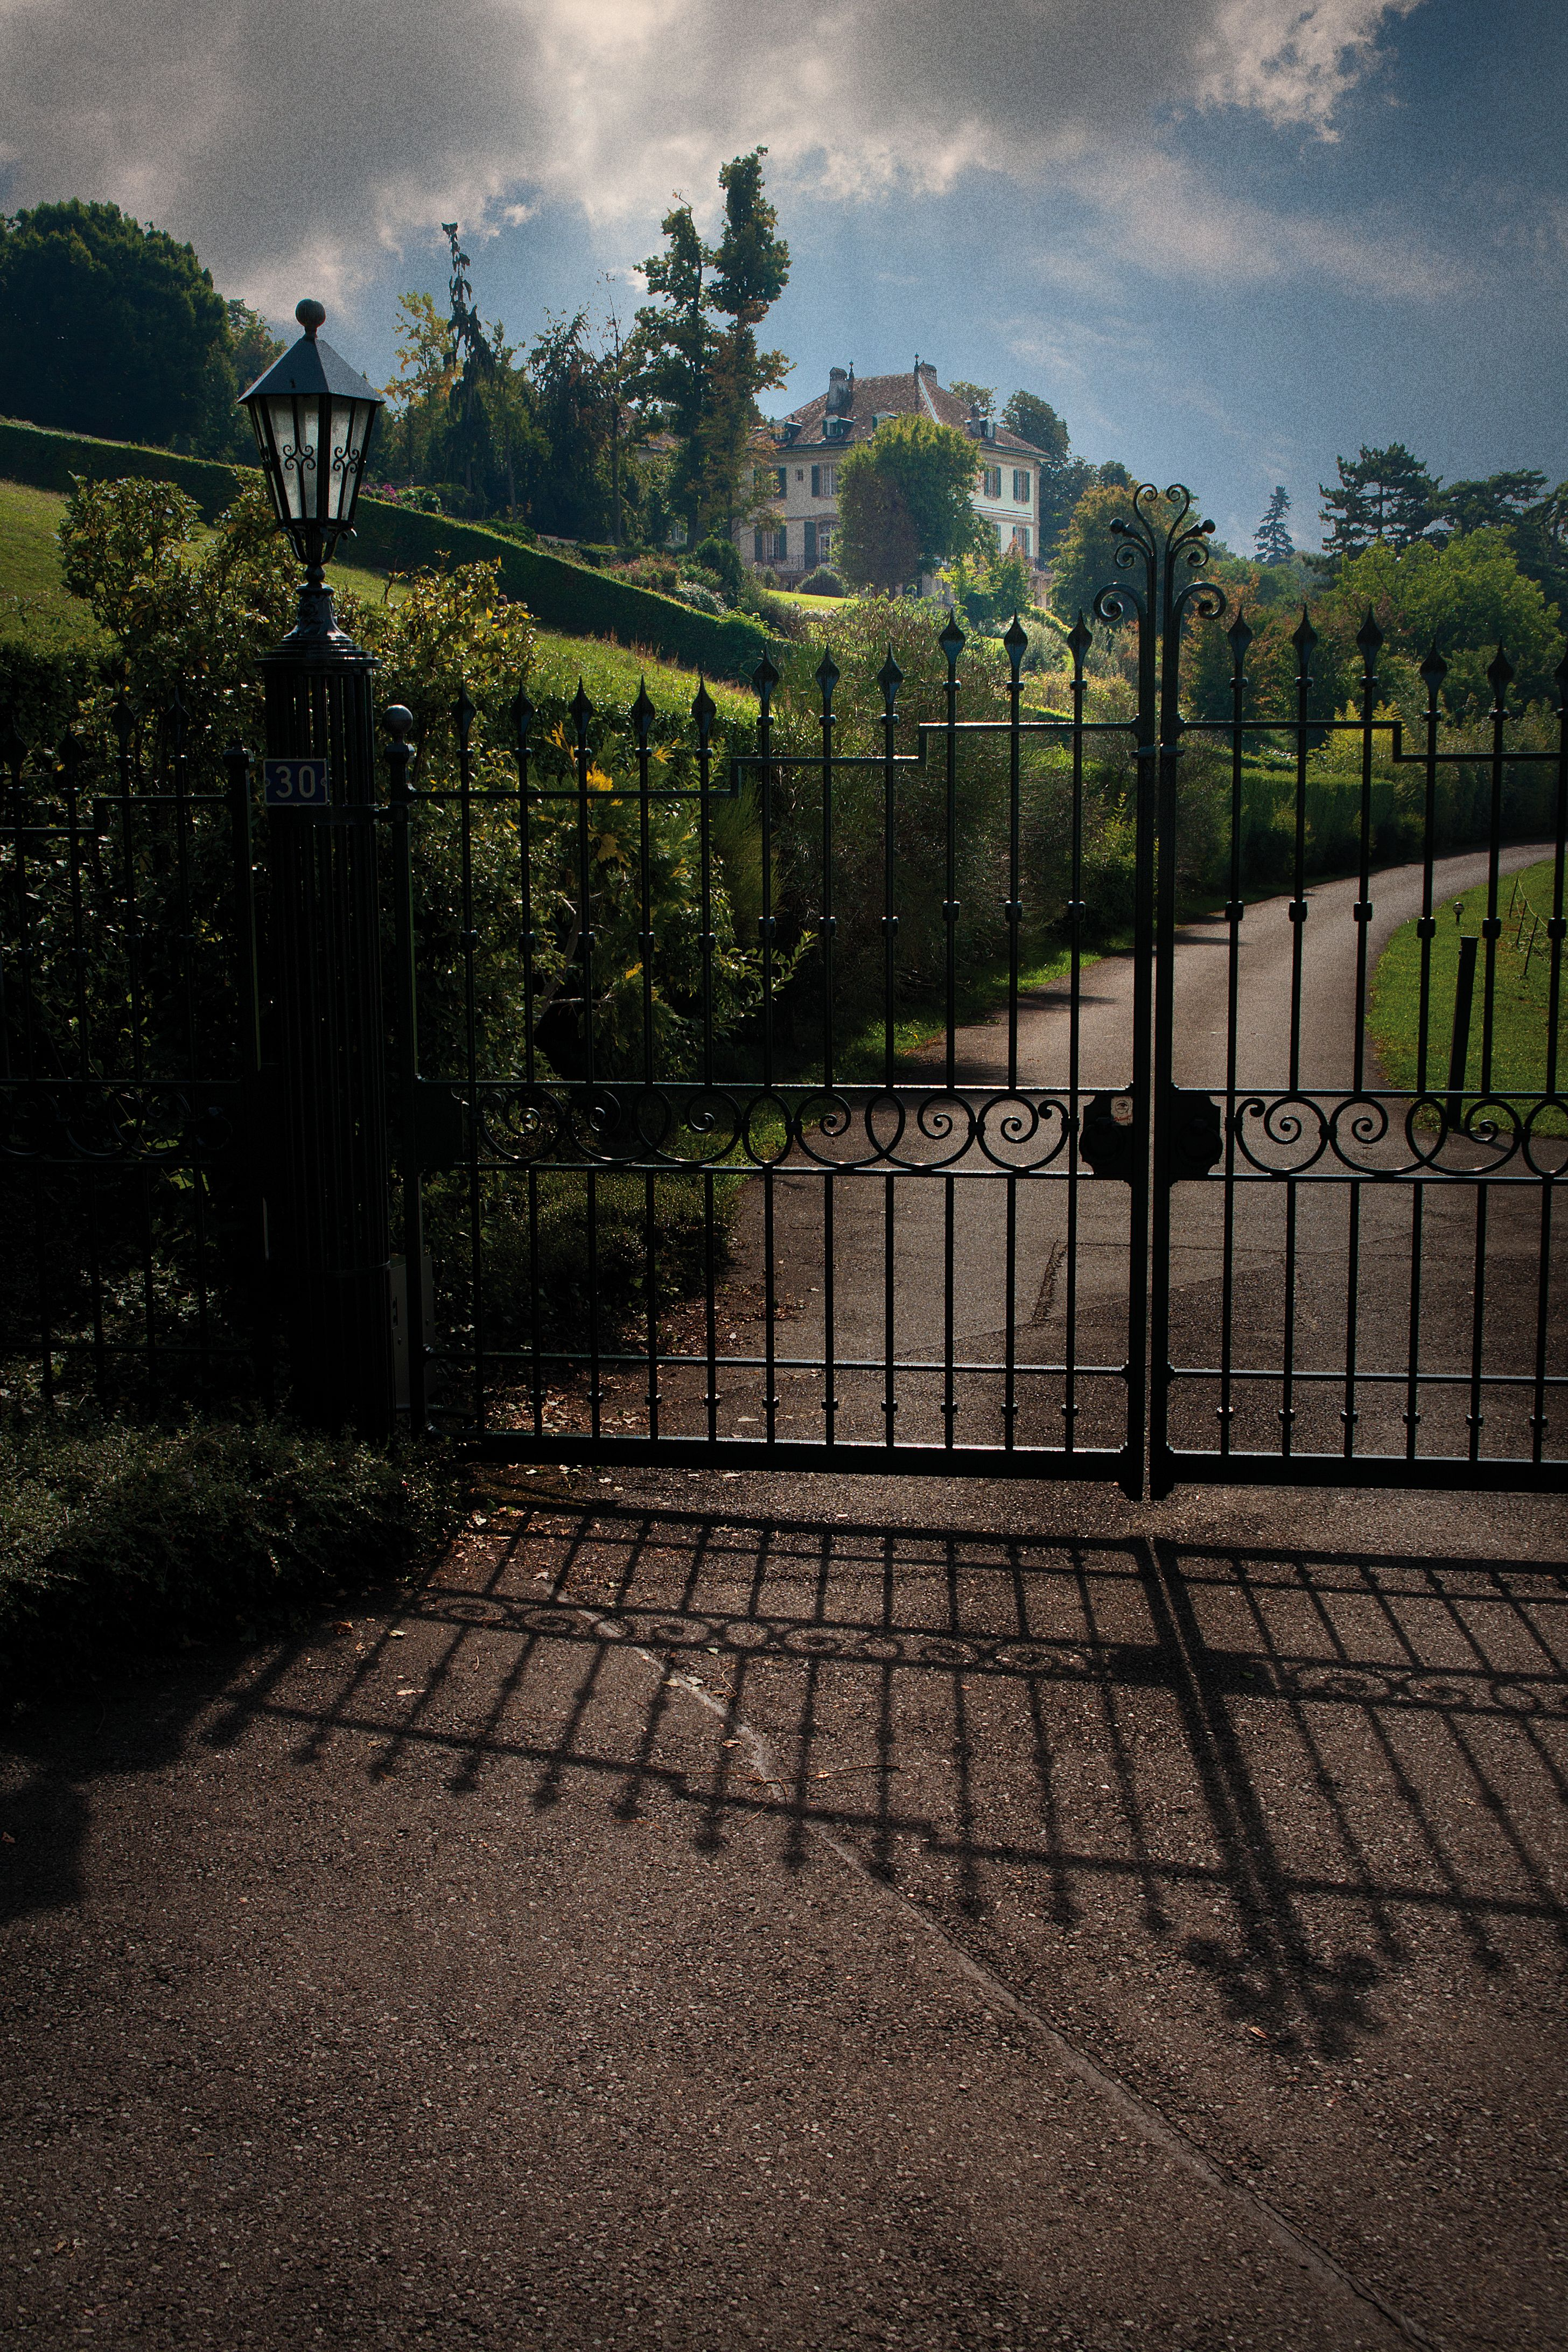 Villa Diodati in Cologny bei Genf (Schweiz)